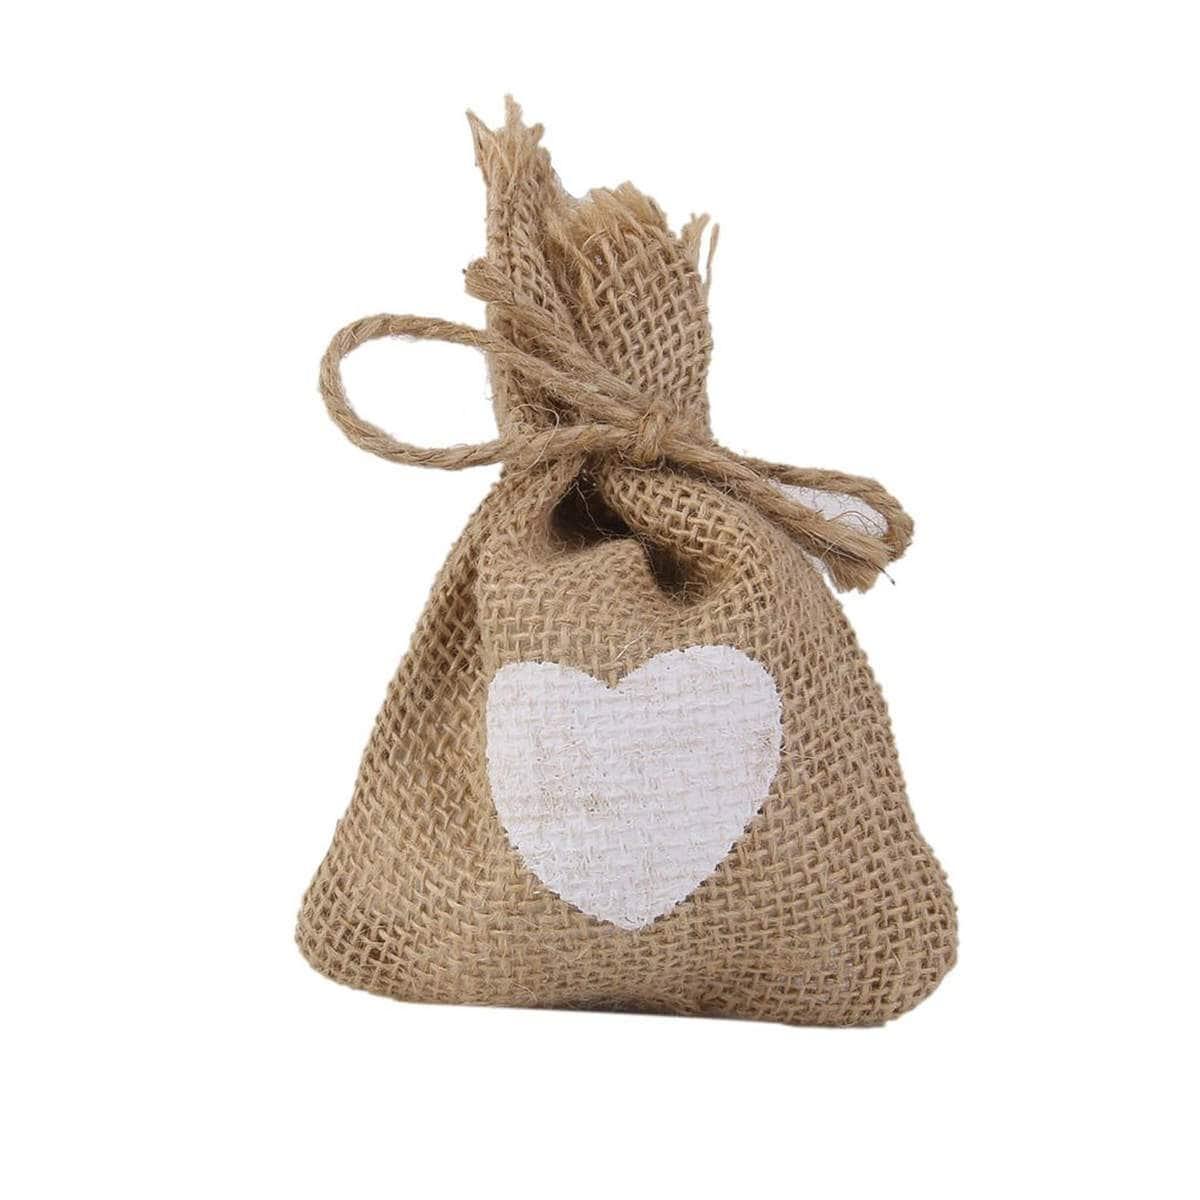 100 HESSIAN FAVOR BAGS, wedding favor bags, burlap bags, wedding ...